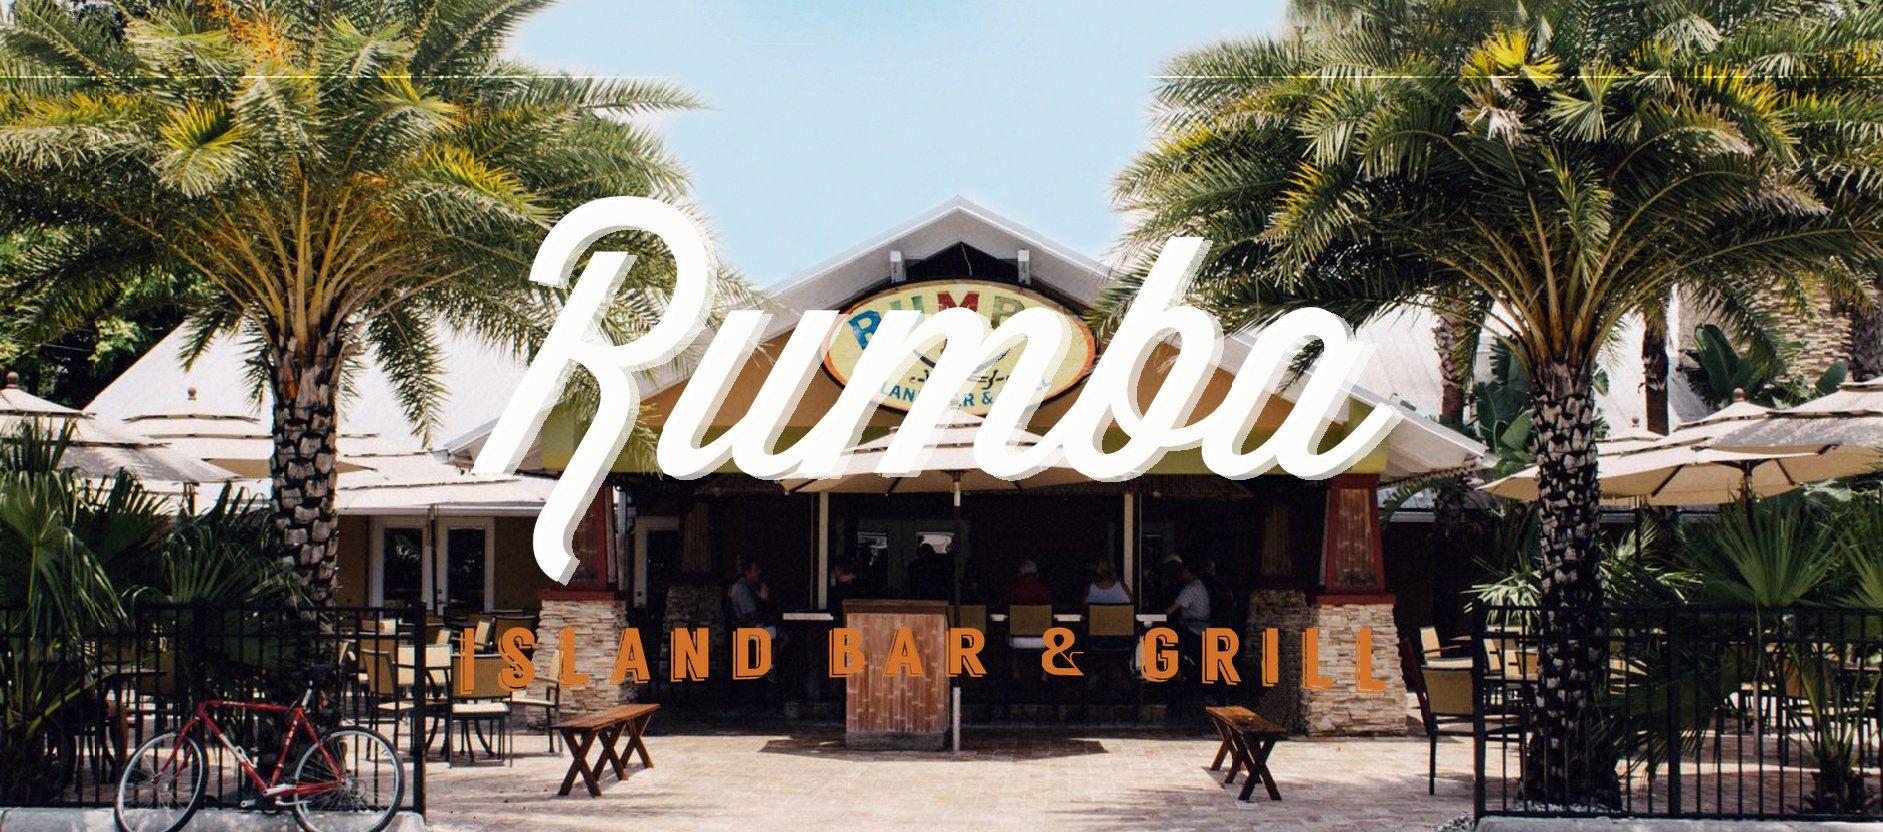 Rumba Island Bar & Grill FOOD Bar grill, Island bar